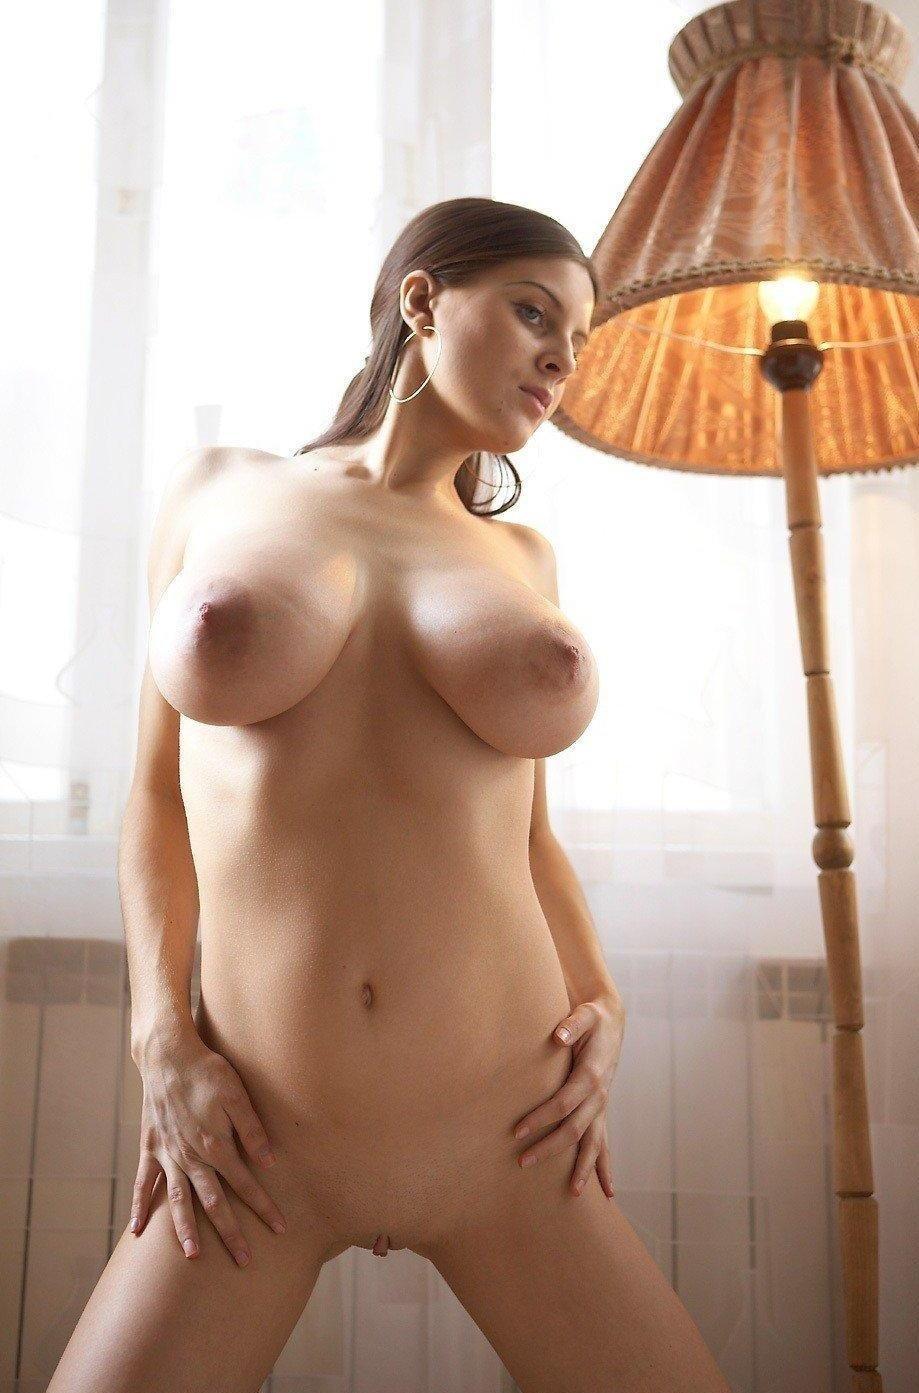 проститутки з 5-м розмиром груди